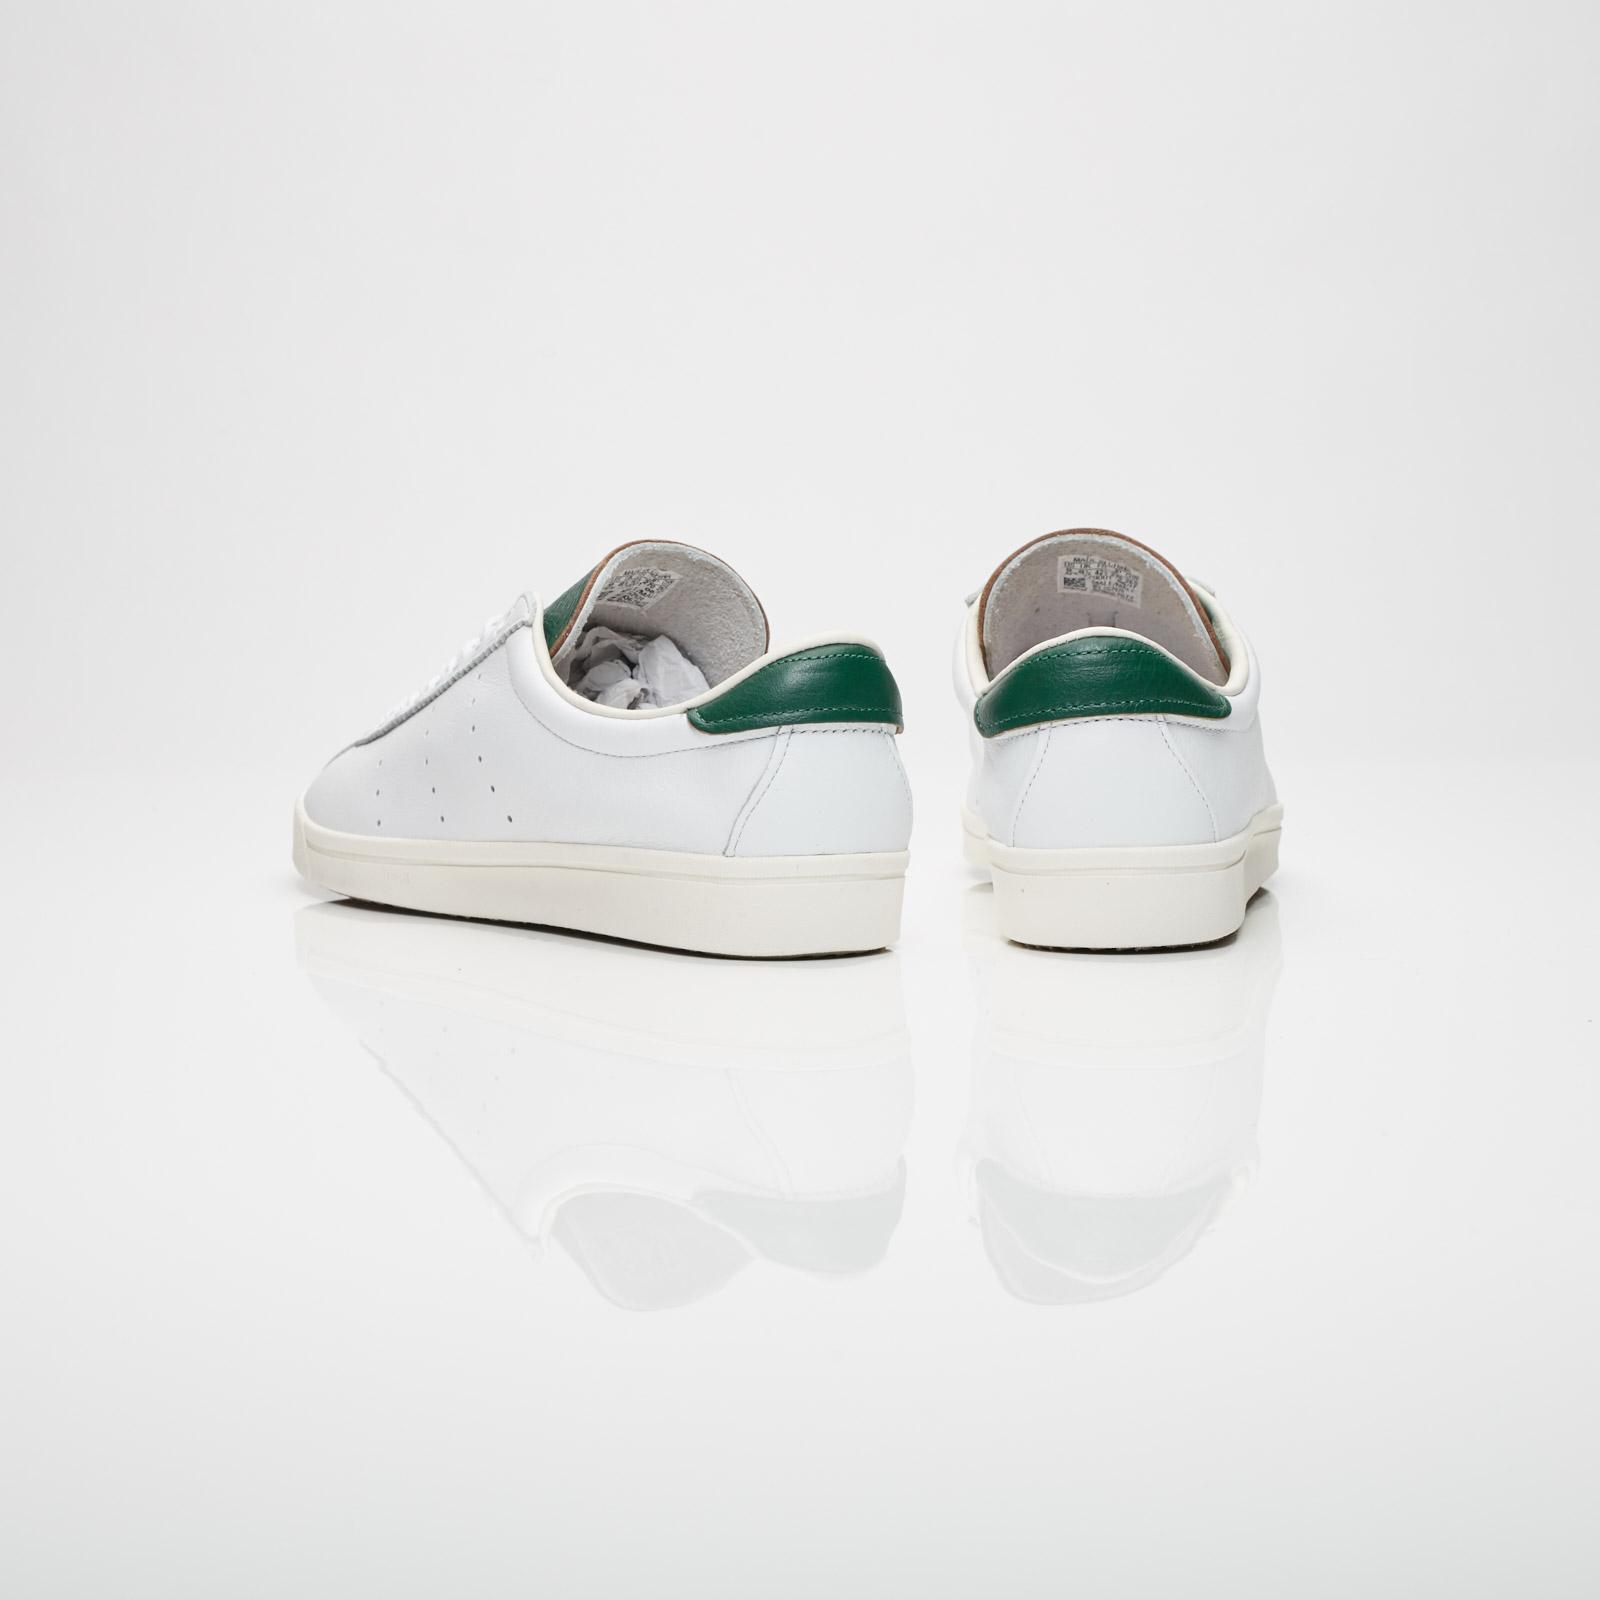 super popular b2d68 c6840 adidas Originals Spezial Lacombe adidas Originals Spezial Lacombe ...